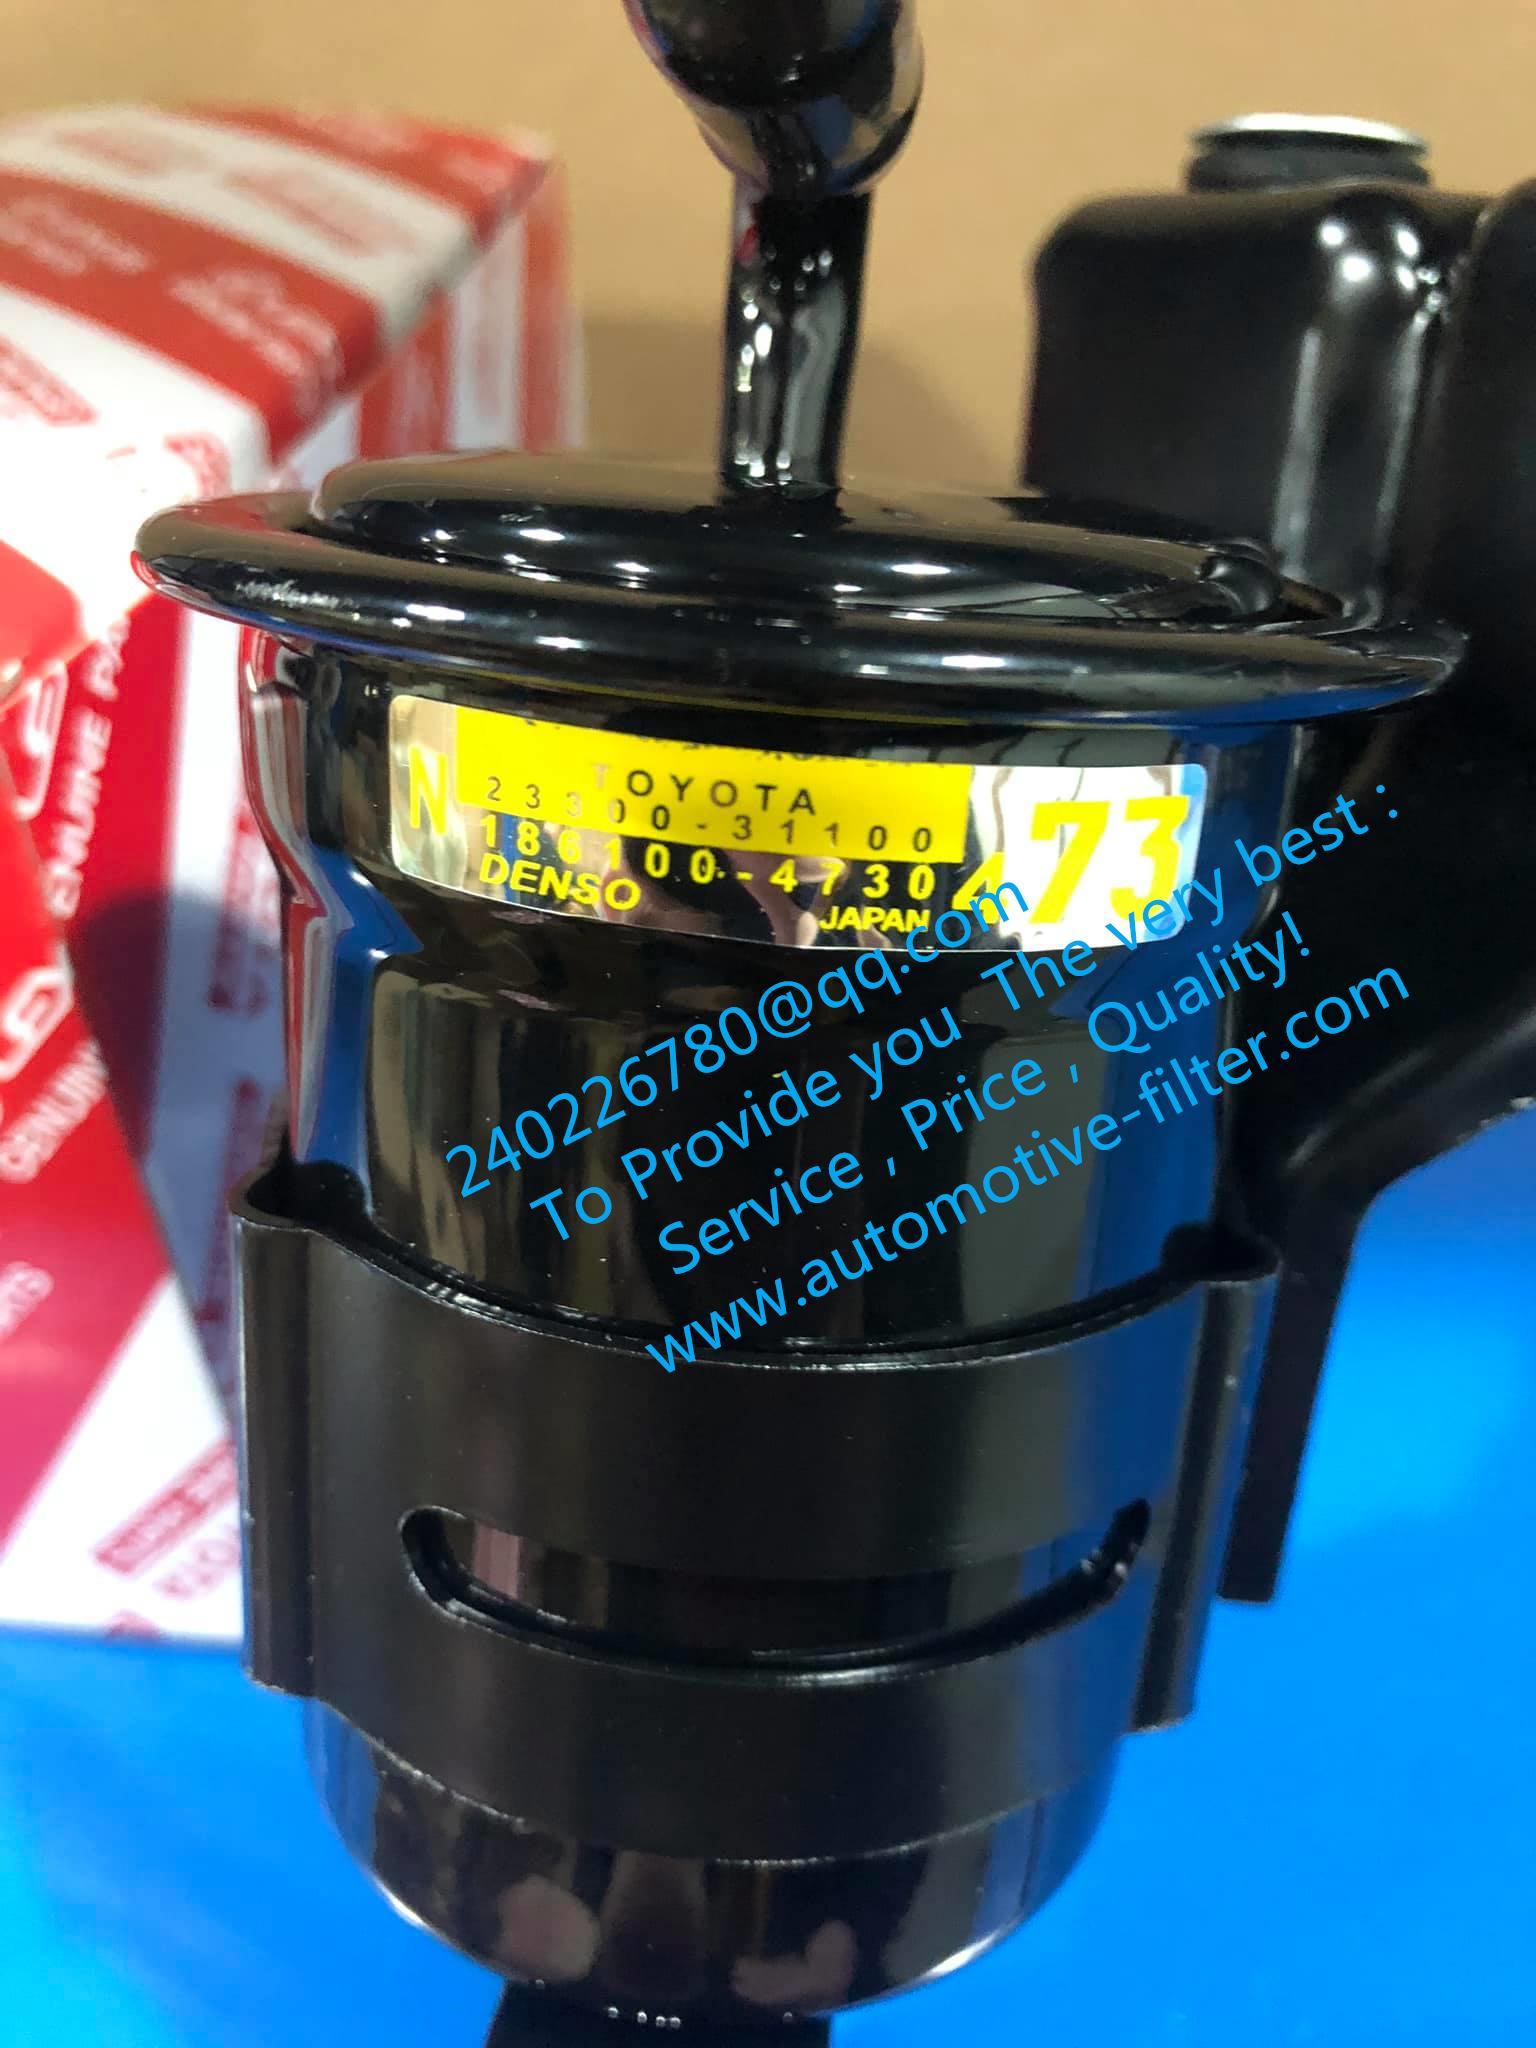 Hot Selling TOYOTA Fuel filter 23300-31100 23300-31120 23300-31090 23300-31160  ,  FOR LAND CRUISER PRADO (_J12_) 4.0 (GRJ125_, GRJ120_) ,HILUX SURF  *23300-31100* Filtro De Gasolina Toyota 4runner Fj Prado  ,Fuel Filter Manufacturers in china,Fuel Filter factory in china,,Fuel filters manufactory in china,China Fuel filter supplier,Diesel Filter Manufacturers in china,Diesel Filter factory in china,,Diesel filters manufactory in china,China Diesel filter supplier,